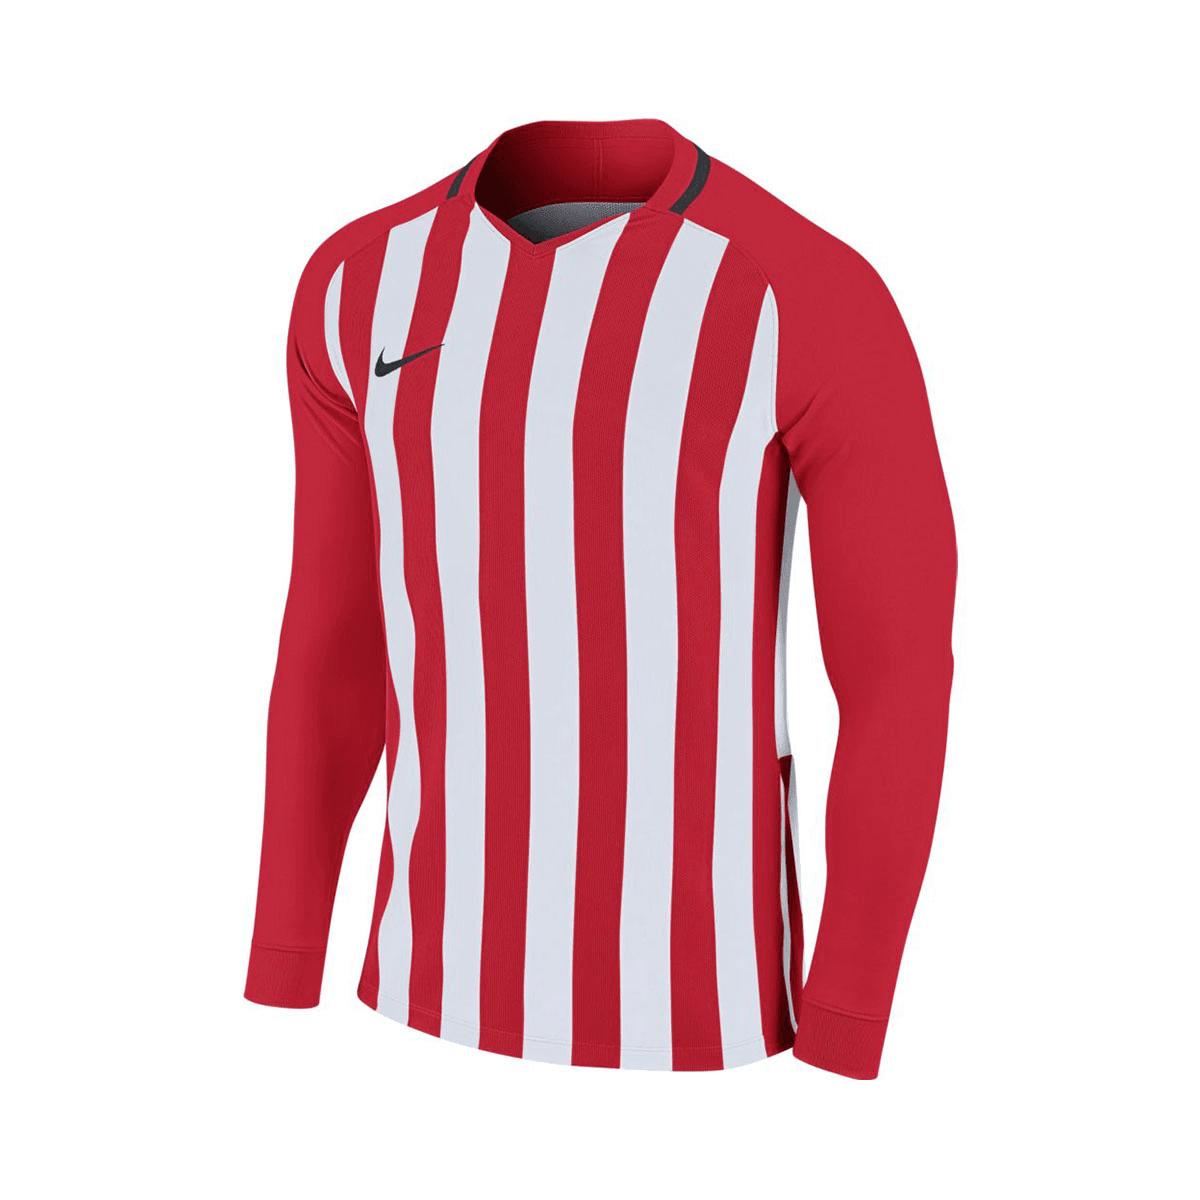 Nike Blau Weiß Fußball Langarm Trikot Striped Division